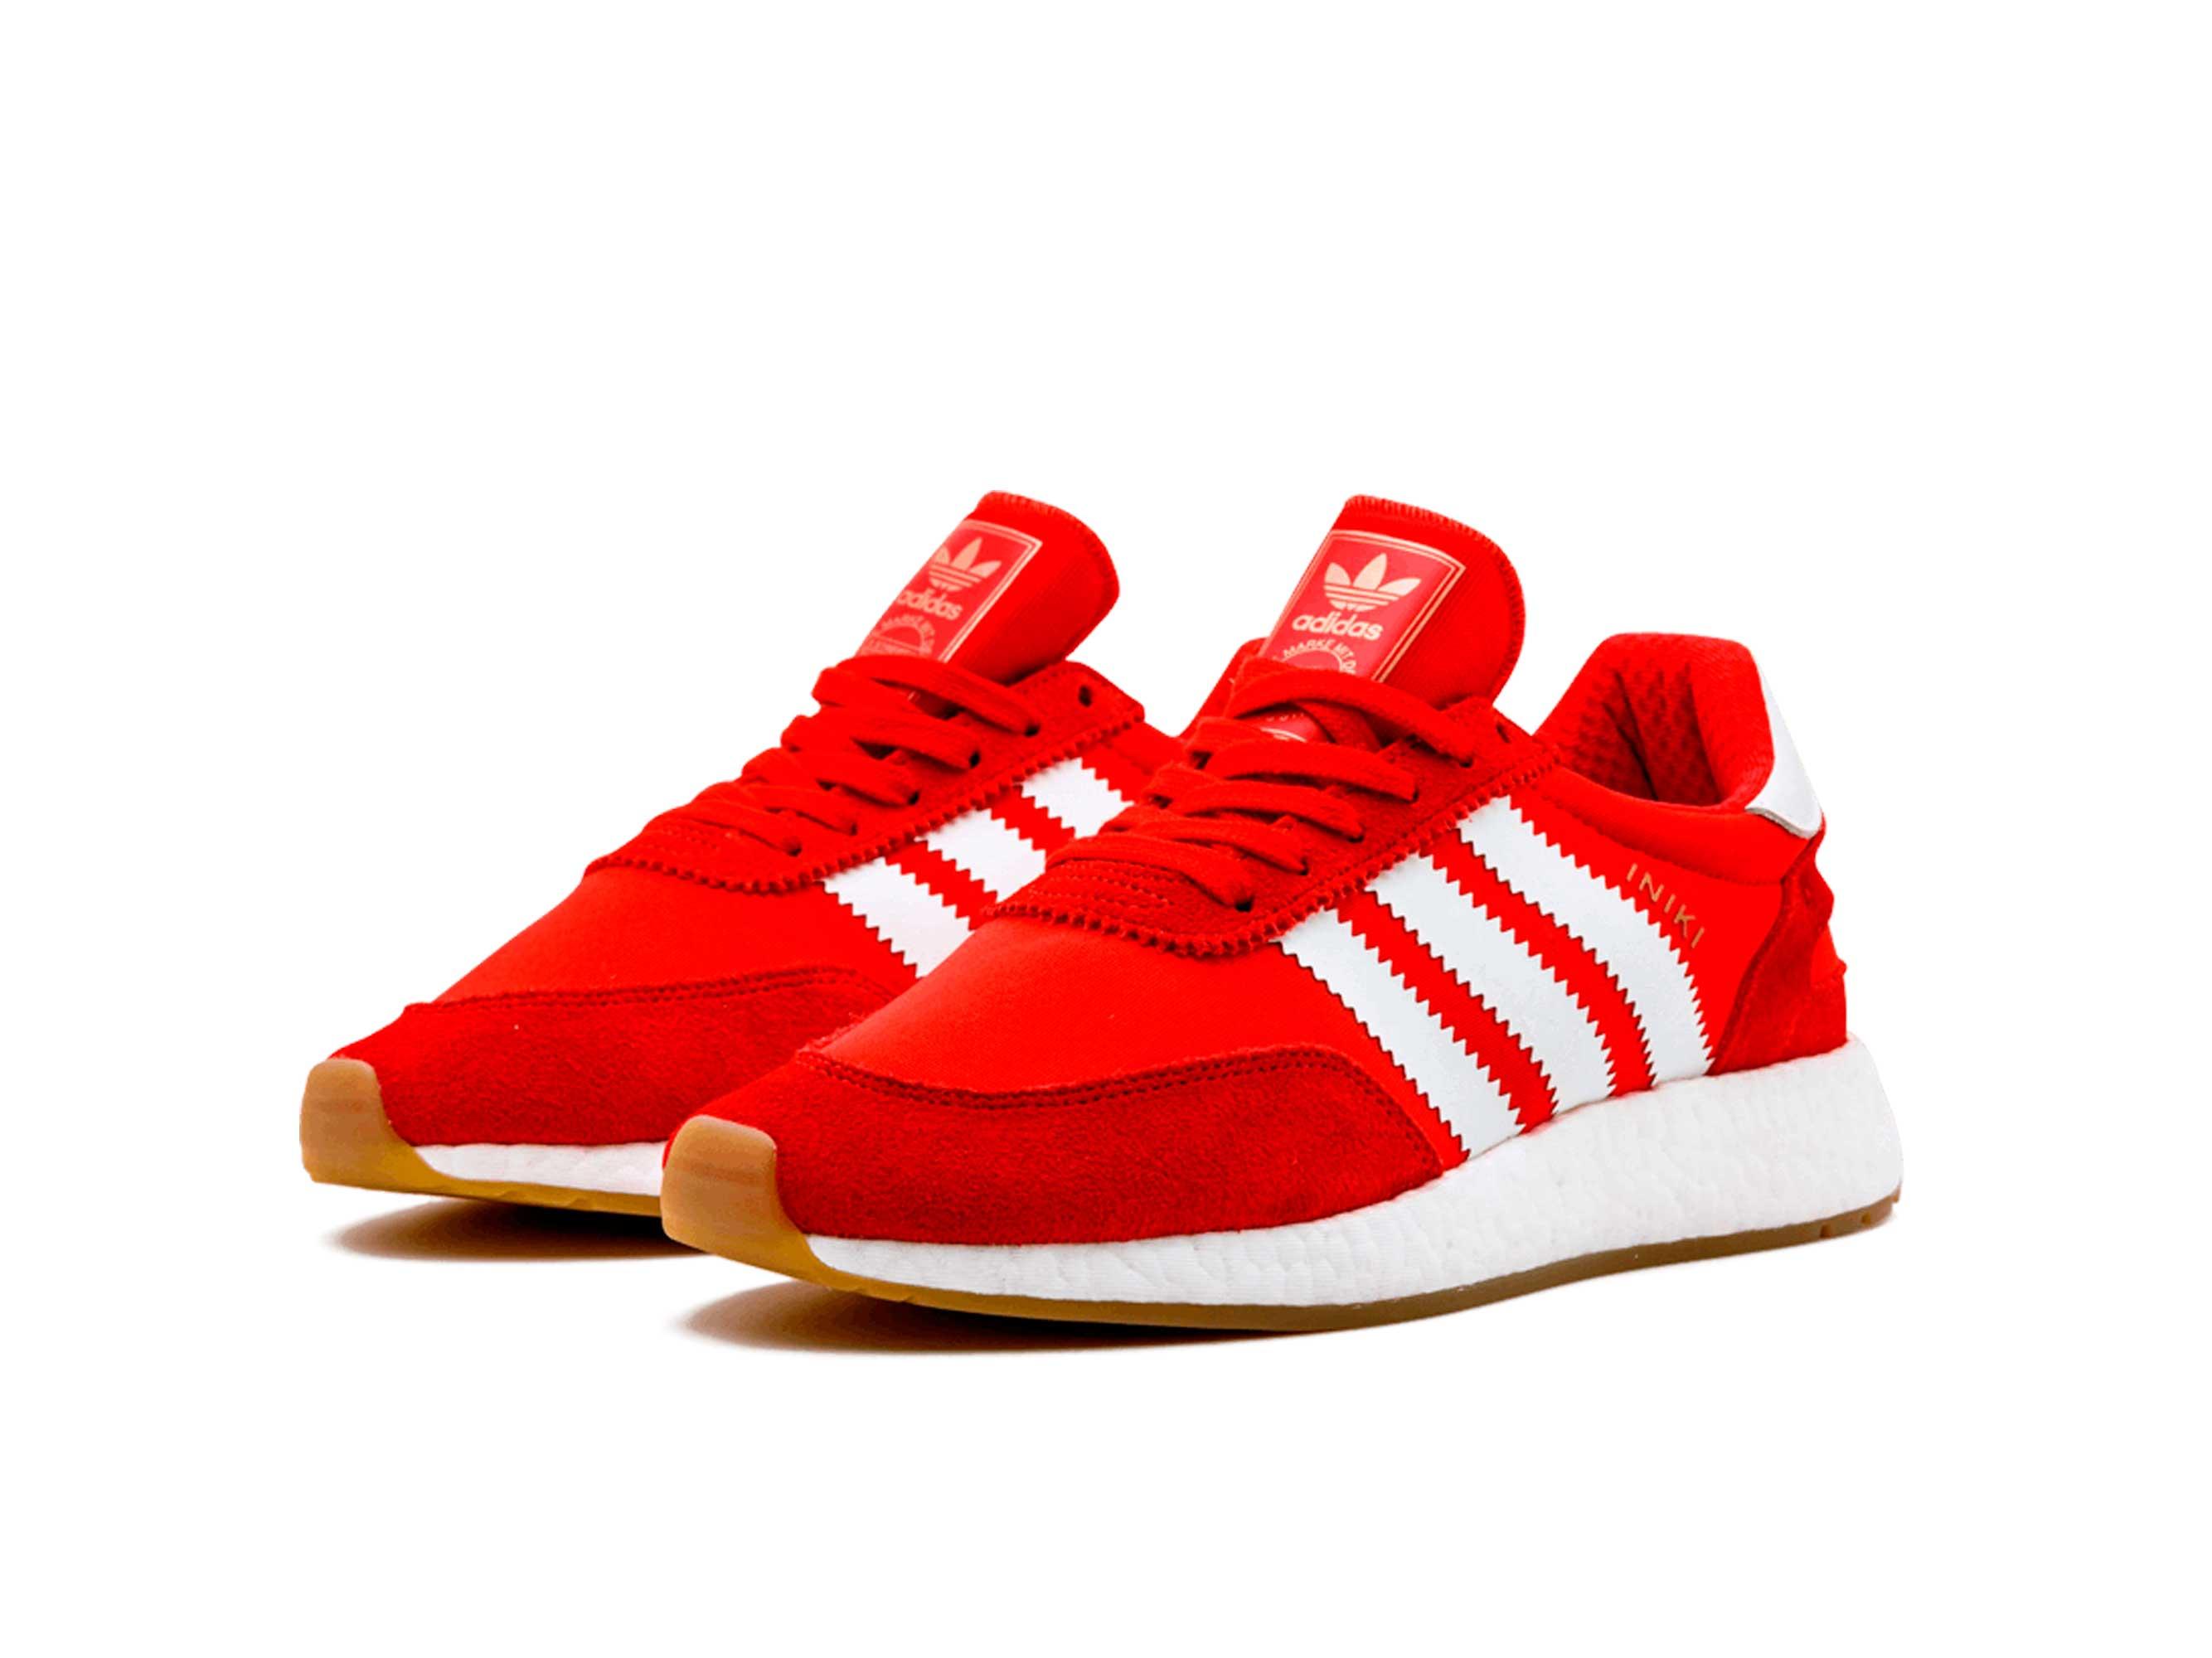 5ae7a634 Оригинальные adidas iniki runner red BB2091 купить